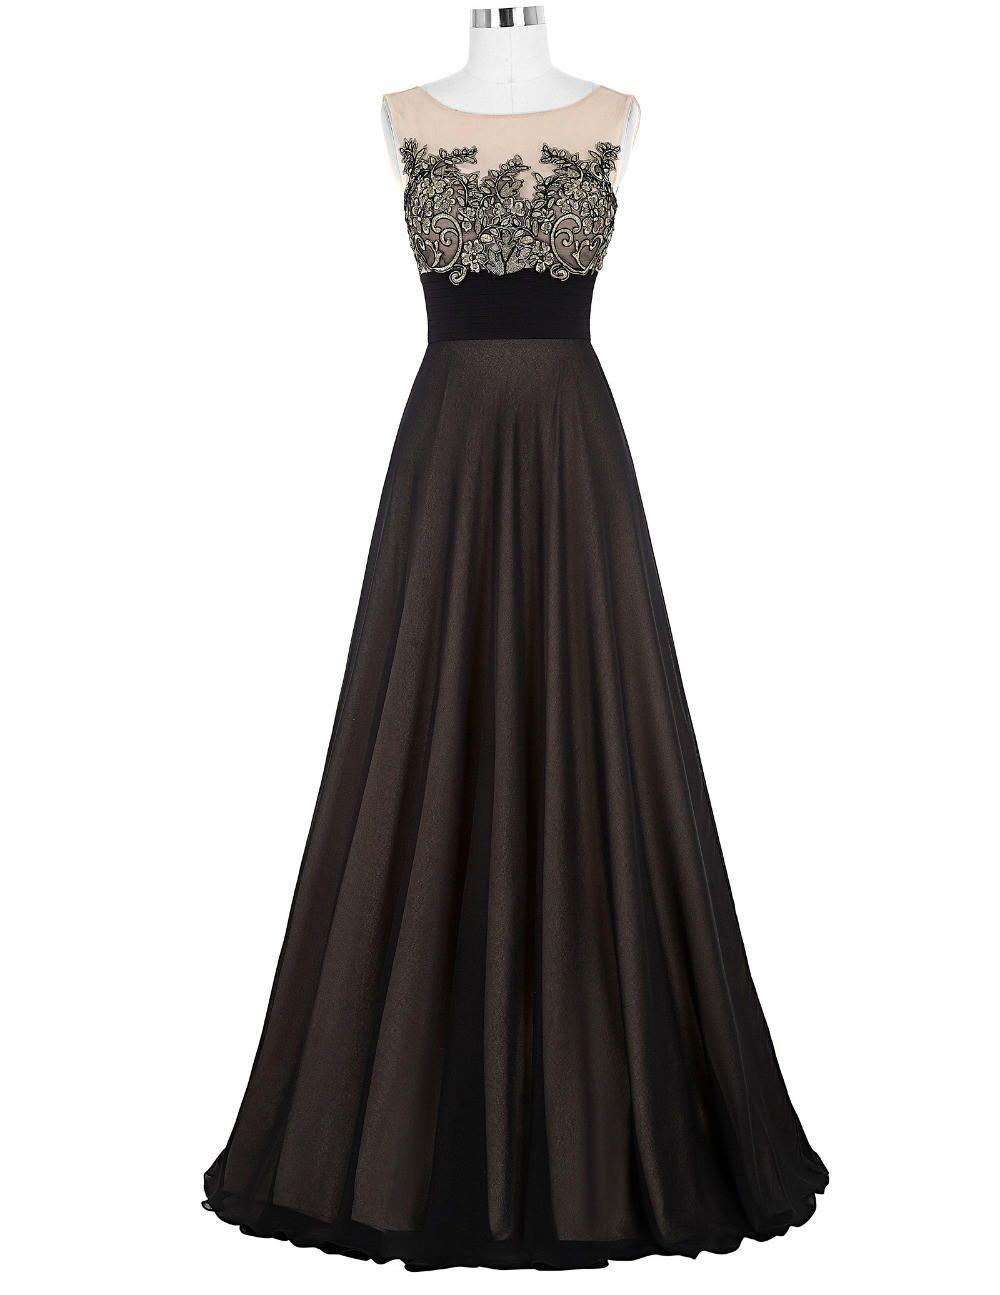 Prom dresses crew neck pleated waist appliques formal promdress